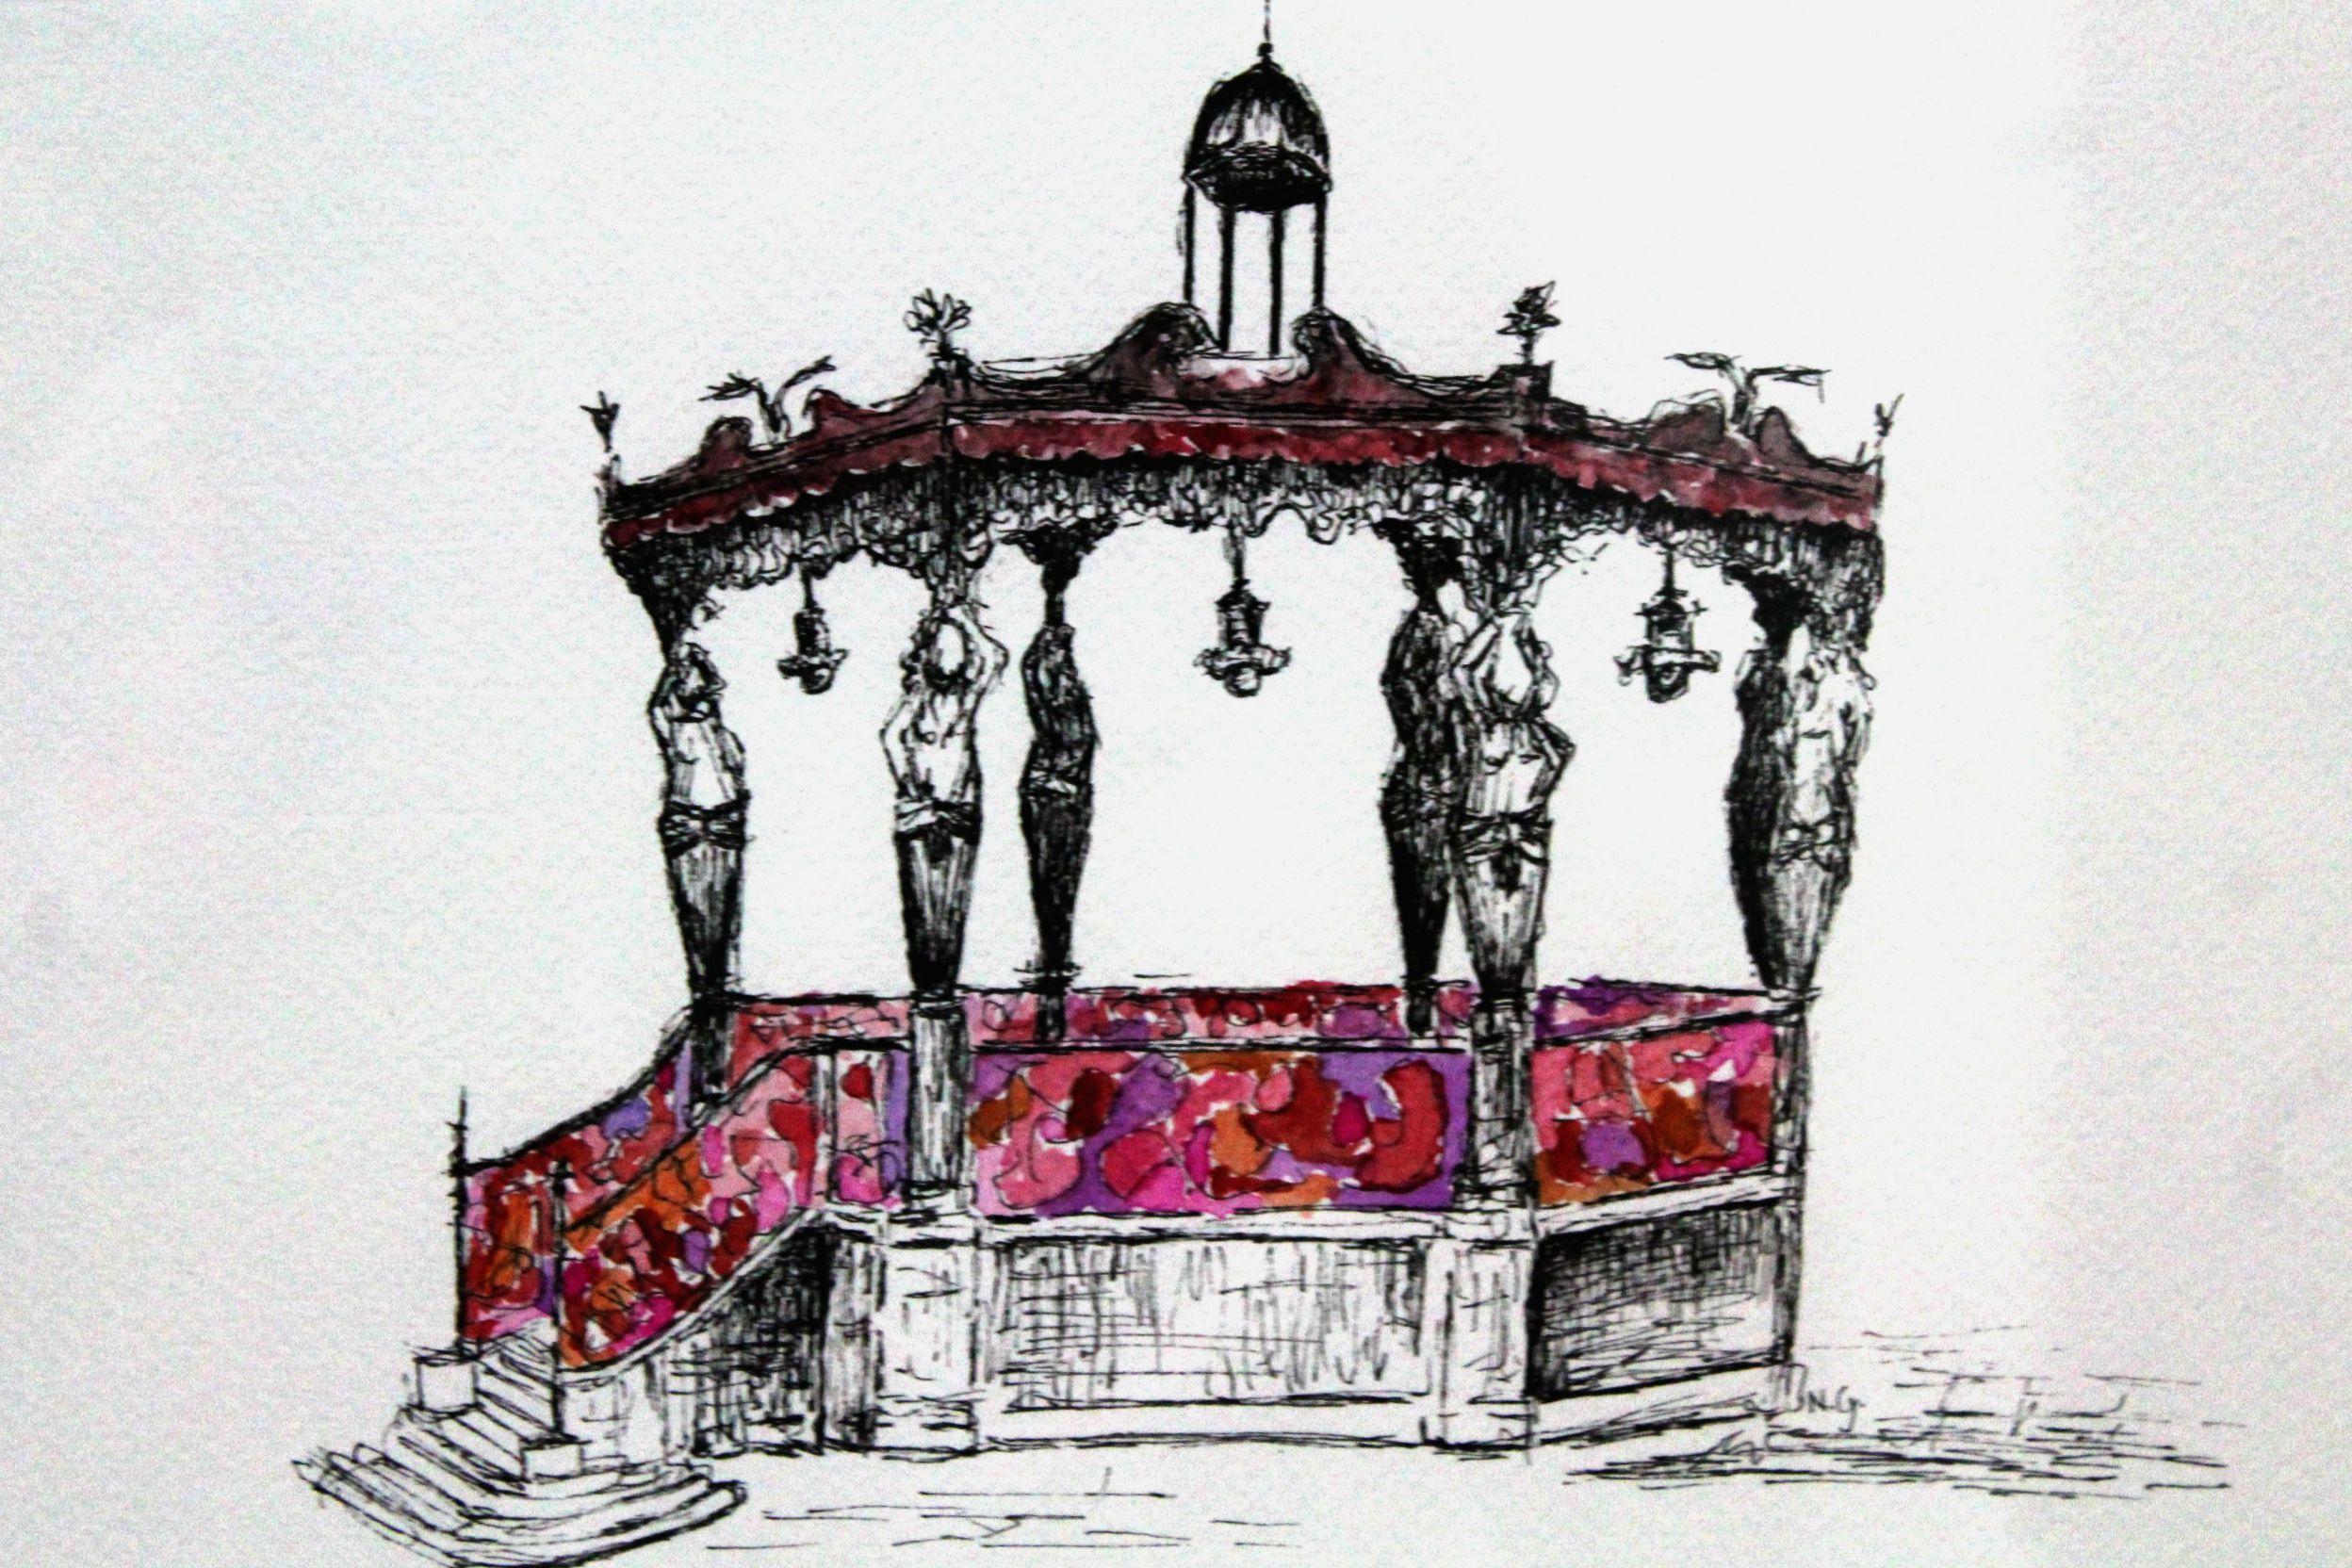 """Kiosco de Plaza de Armas"", Natalie Gonzalez de Urban Scketchers Guadalajara"